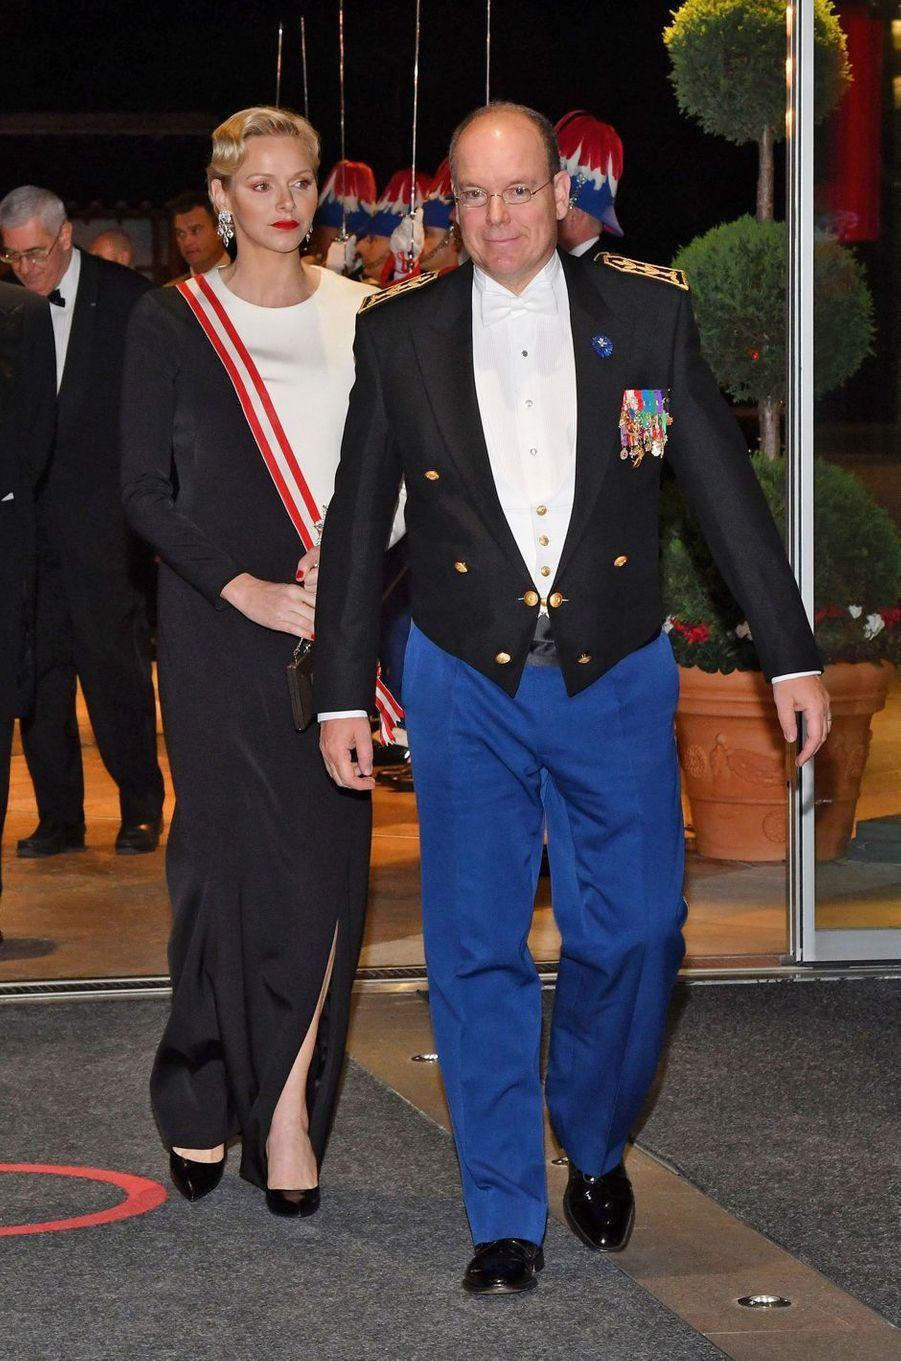 Le prince Albert II de Monaco et sa femme la princesse Charlène, à Monaco le 19 novembre 2018